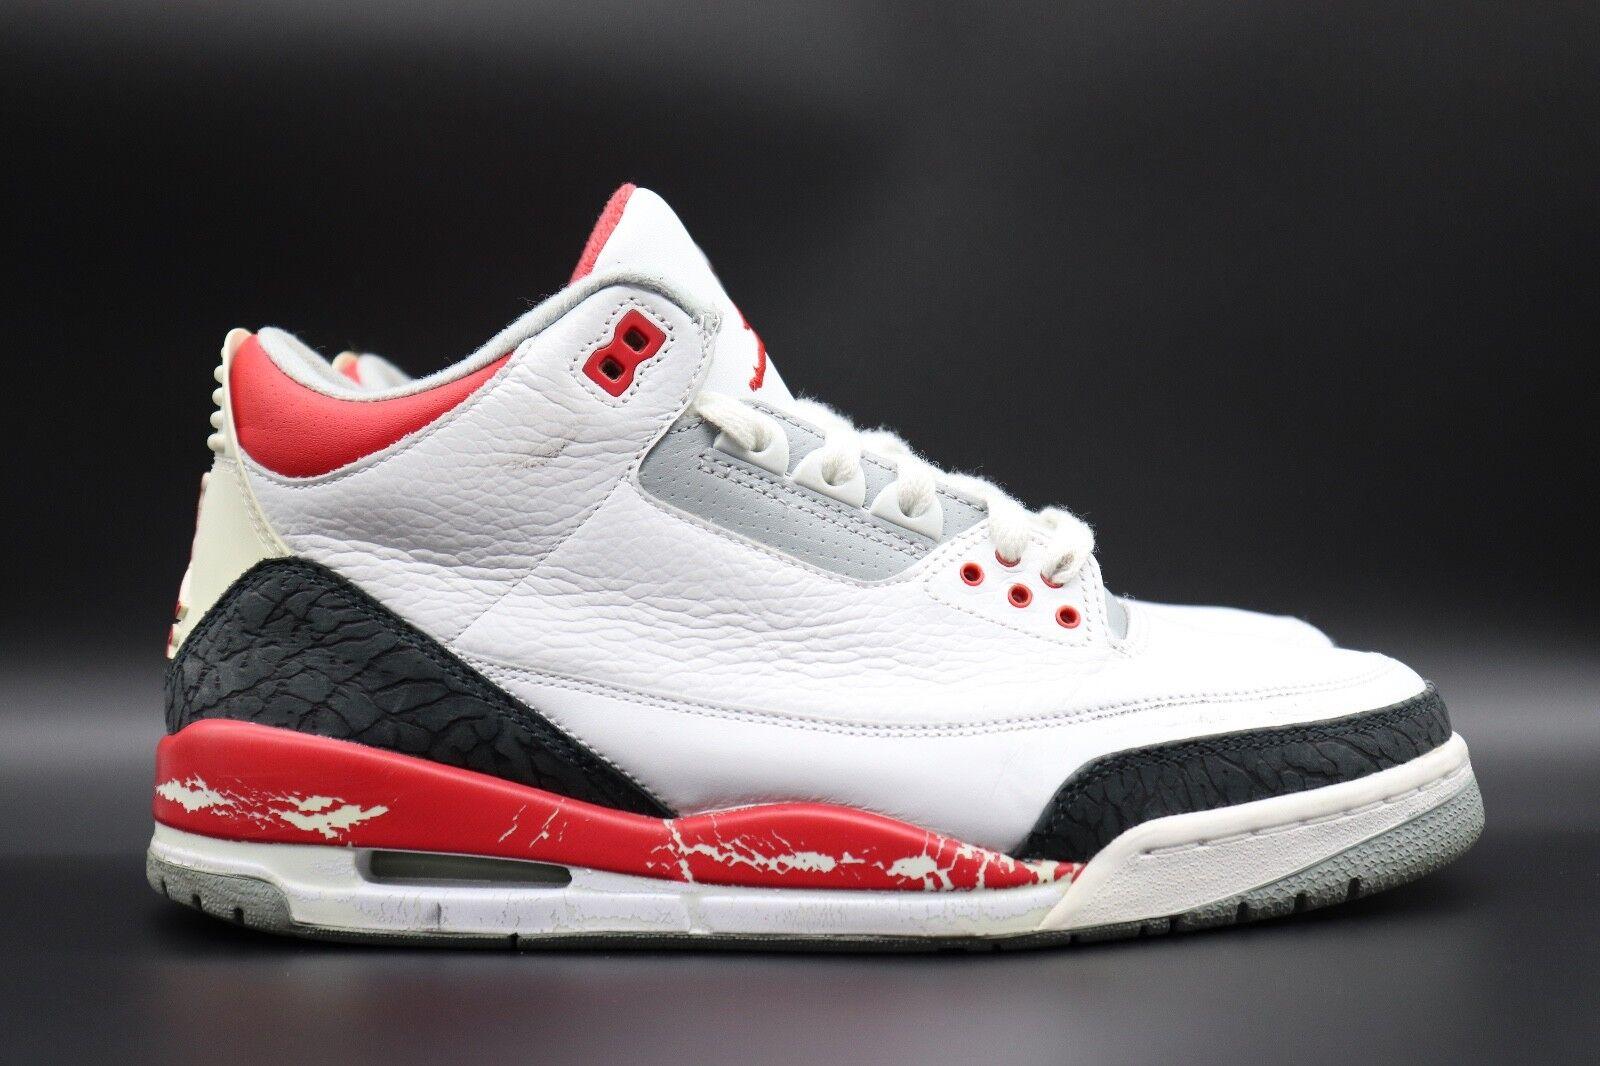 Nike Air Jordan 3 sz 9.5 Fire Red 2005 Cement DTRT Cool Grey JT FT Free Throw